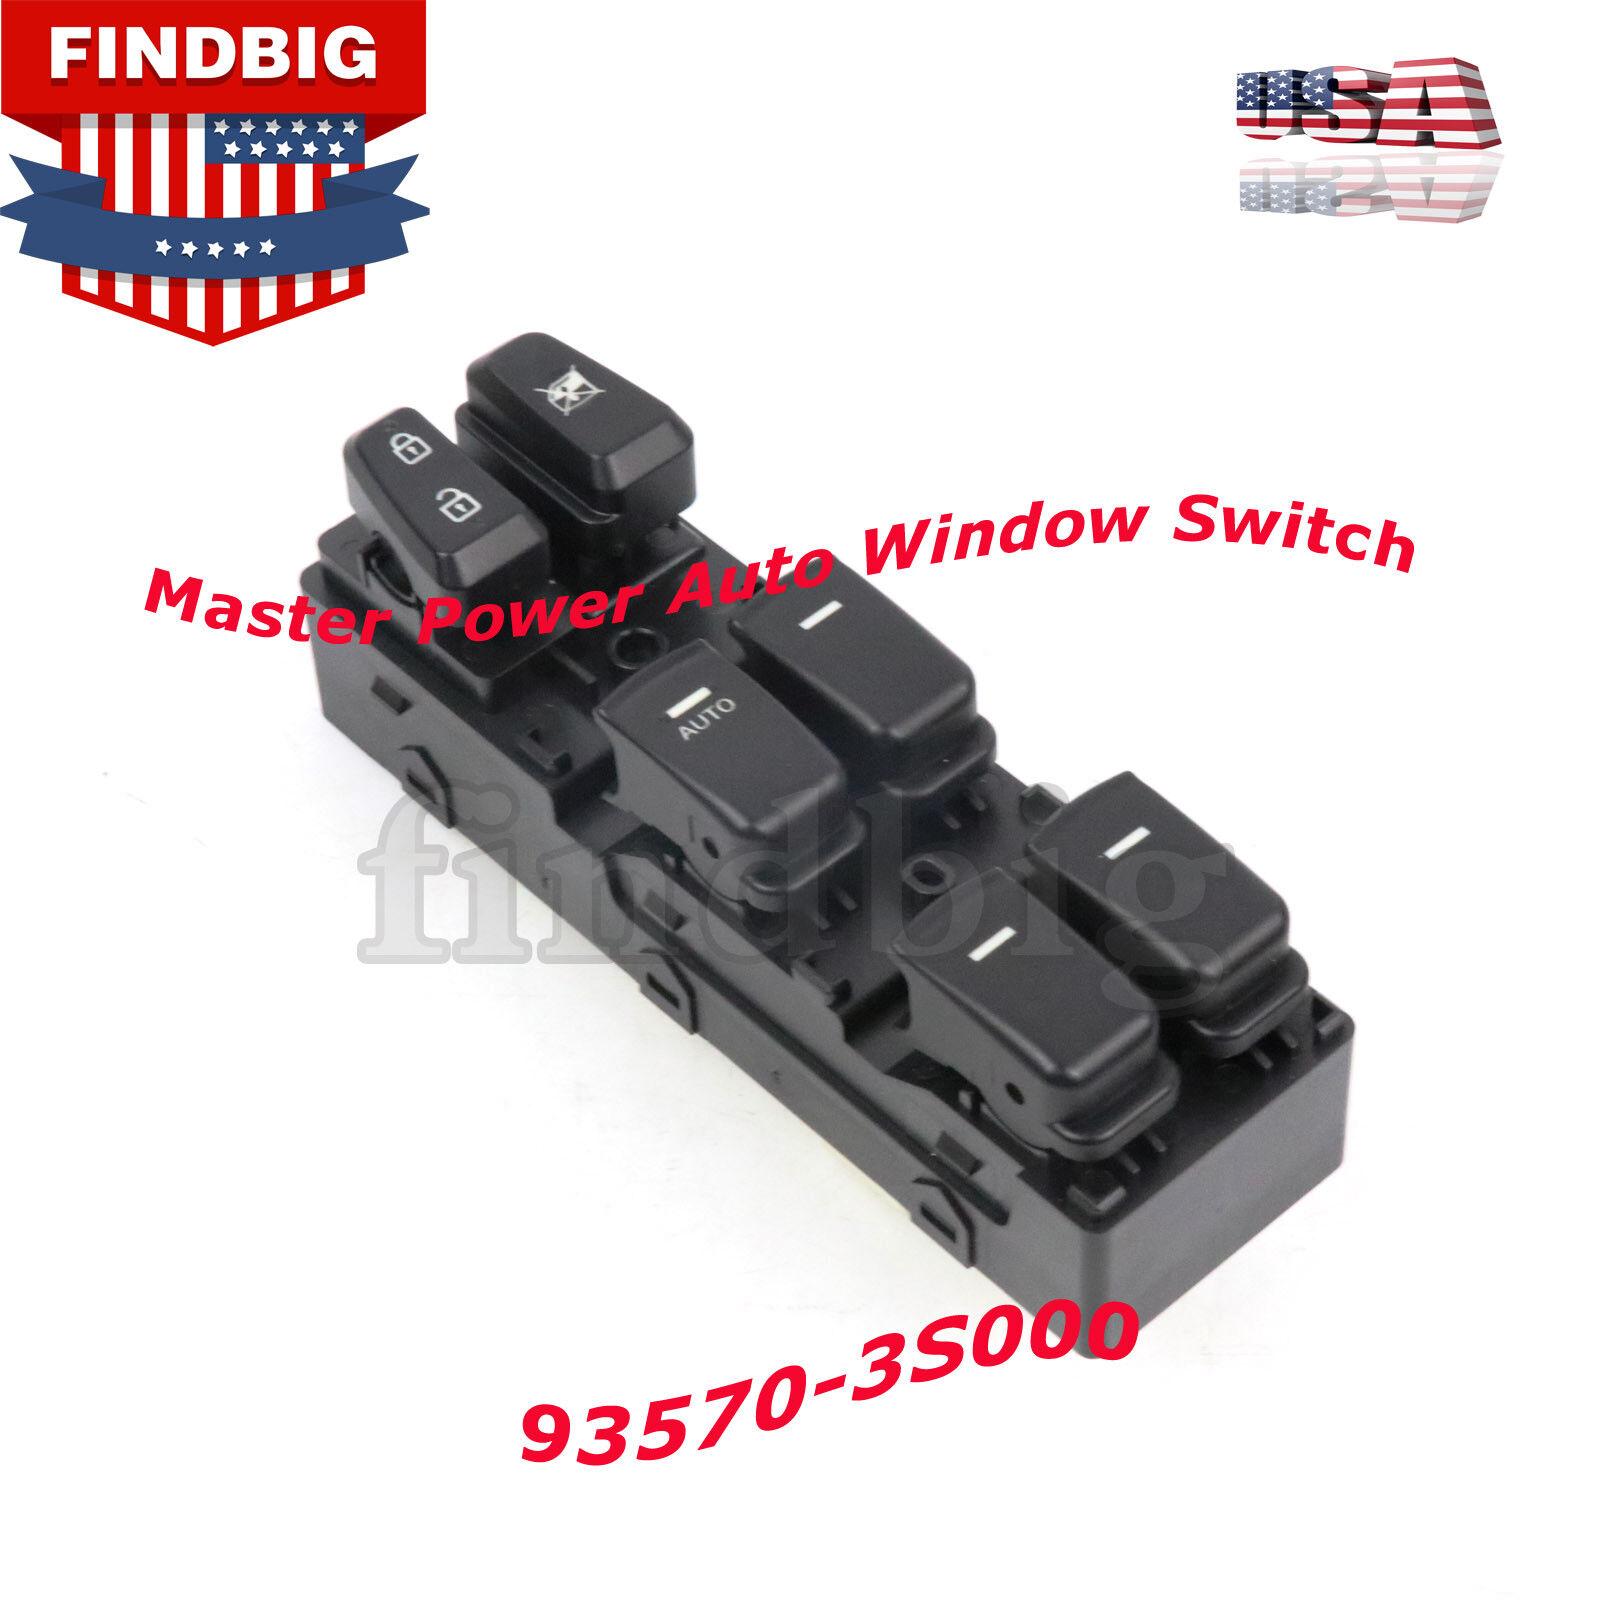 Master Power Window Control Switch for 2011-2015 Hyundai Sonata NEW